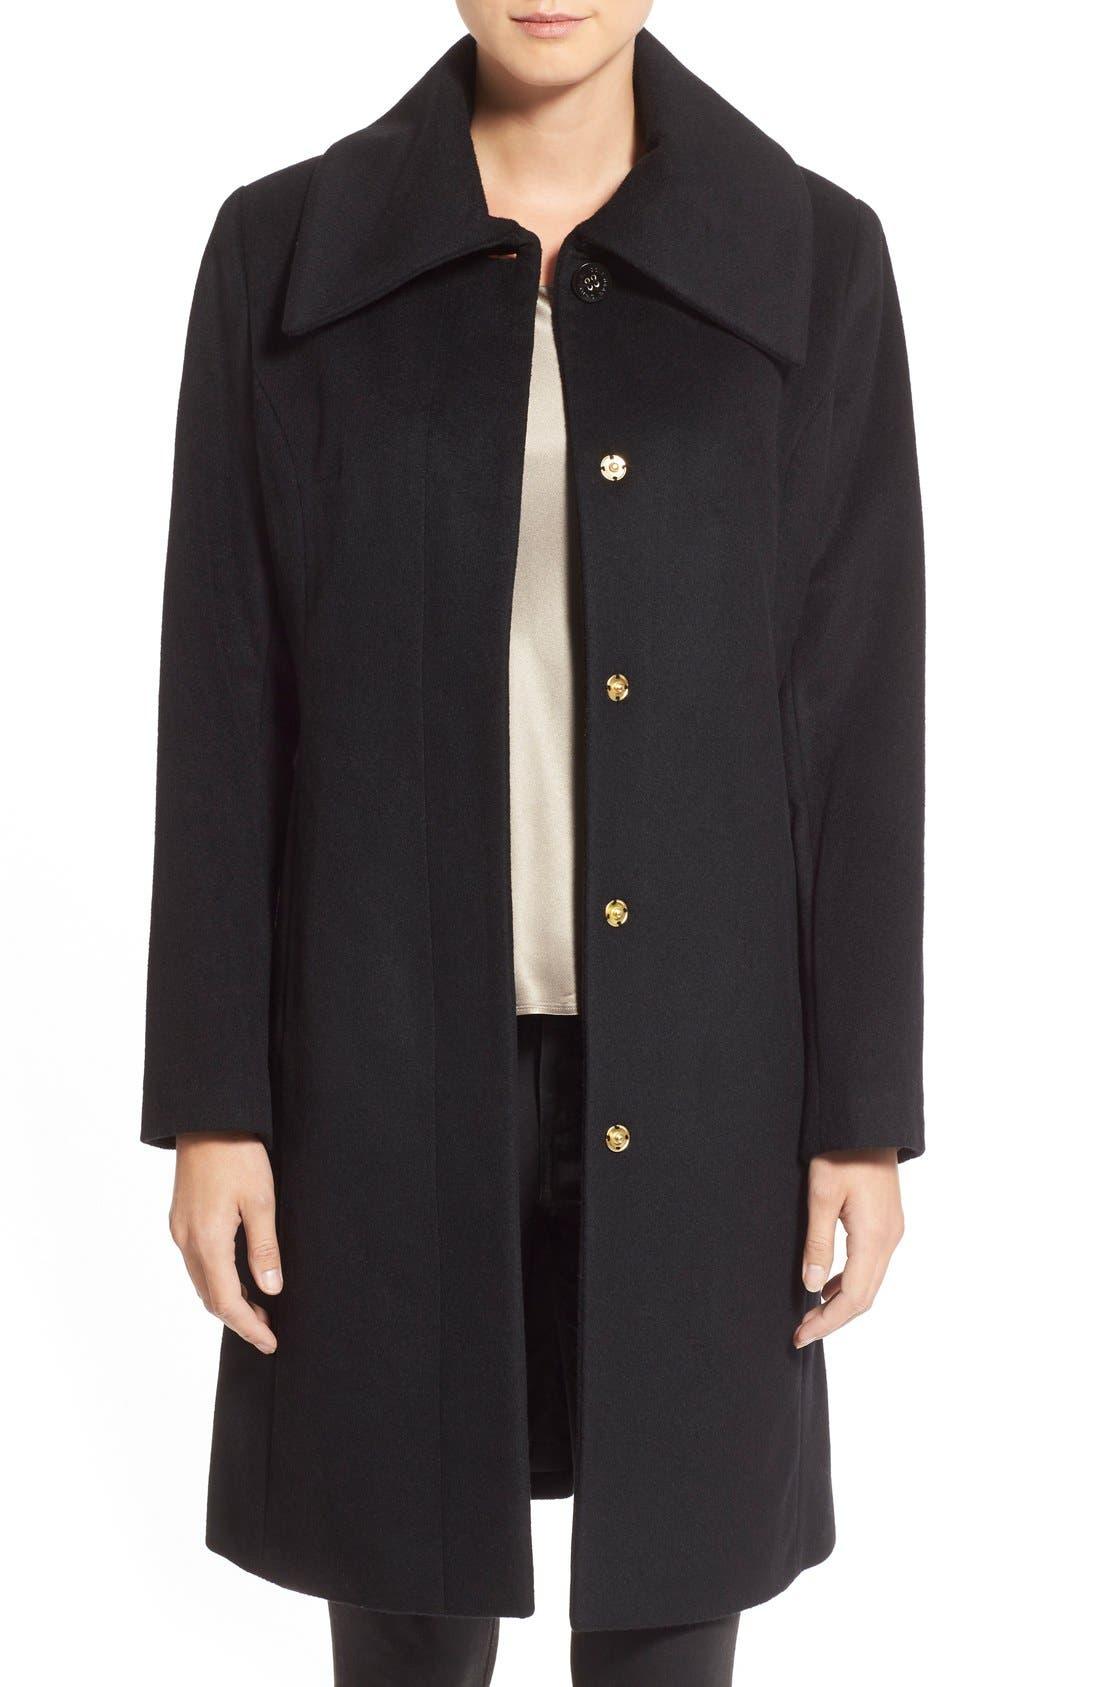 Alternate Image 1 Selected - Cole Haan SignatureSingle Breasted Wool Blend Coat (Regular & Petite)